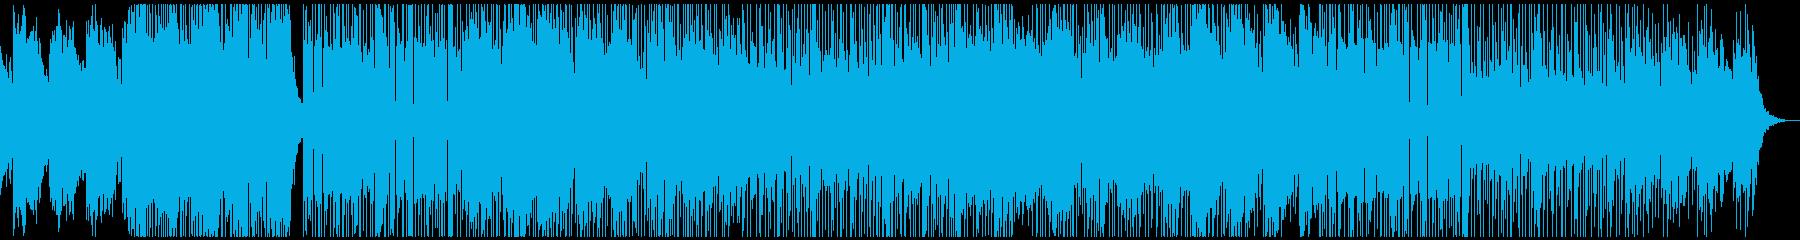 City感のあるEDMサウンドトラックでの再生済みの波形